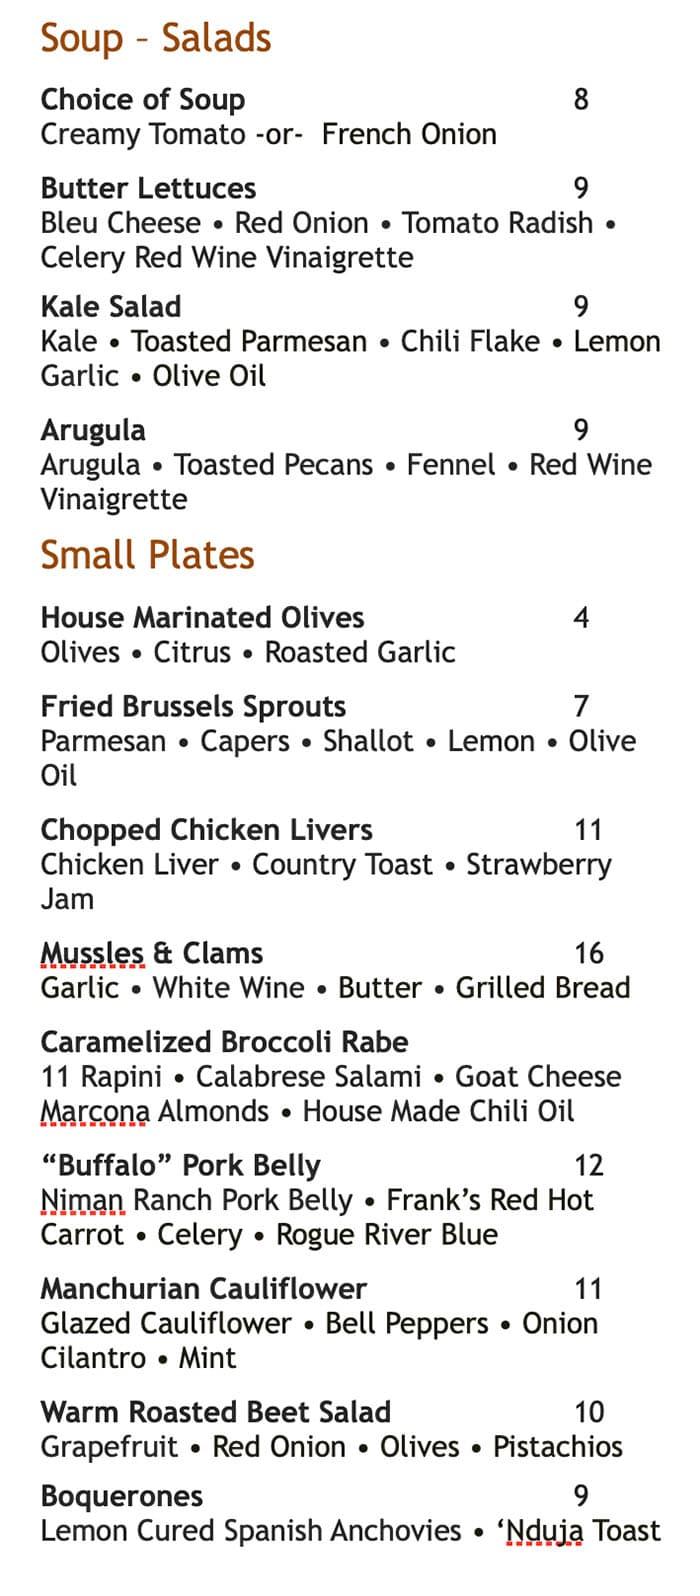 Martine Cafe dinner menu - soups, salads, small plates